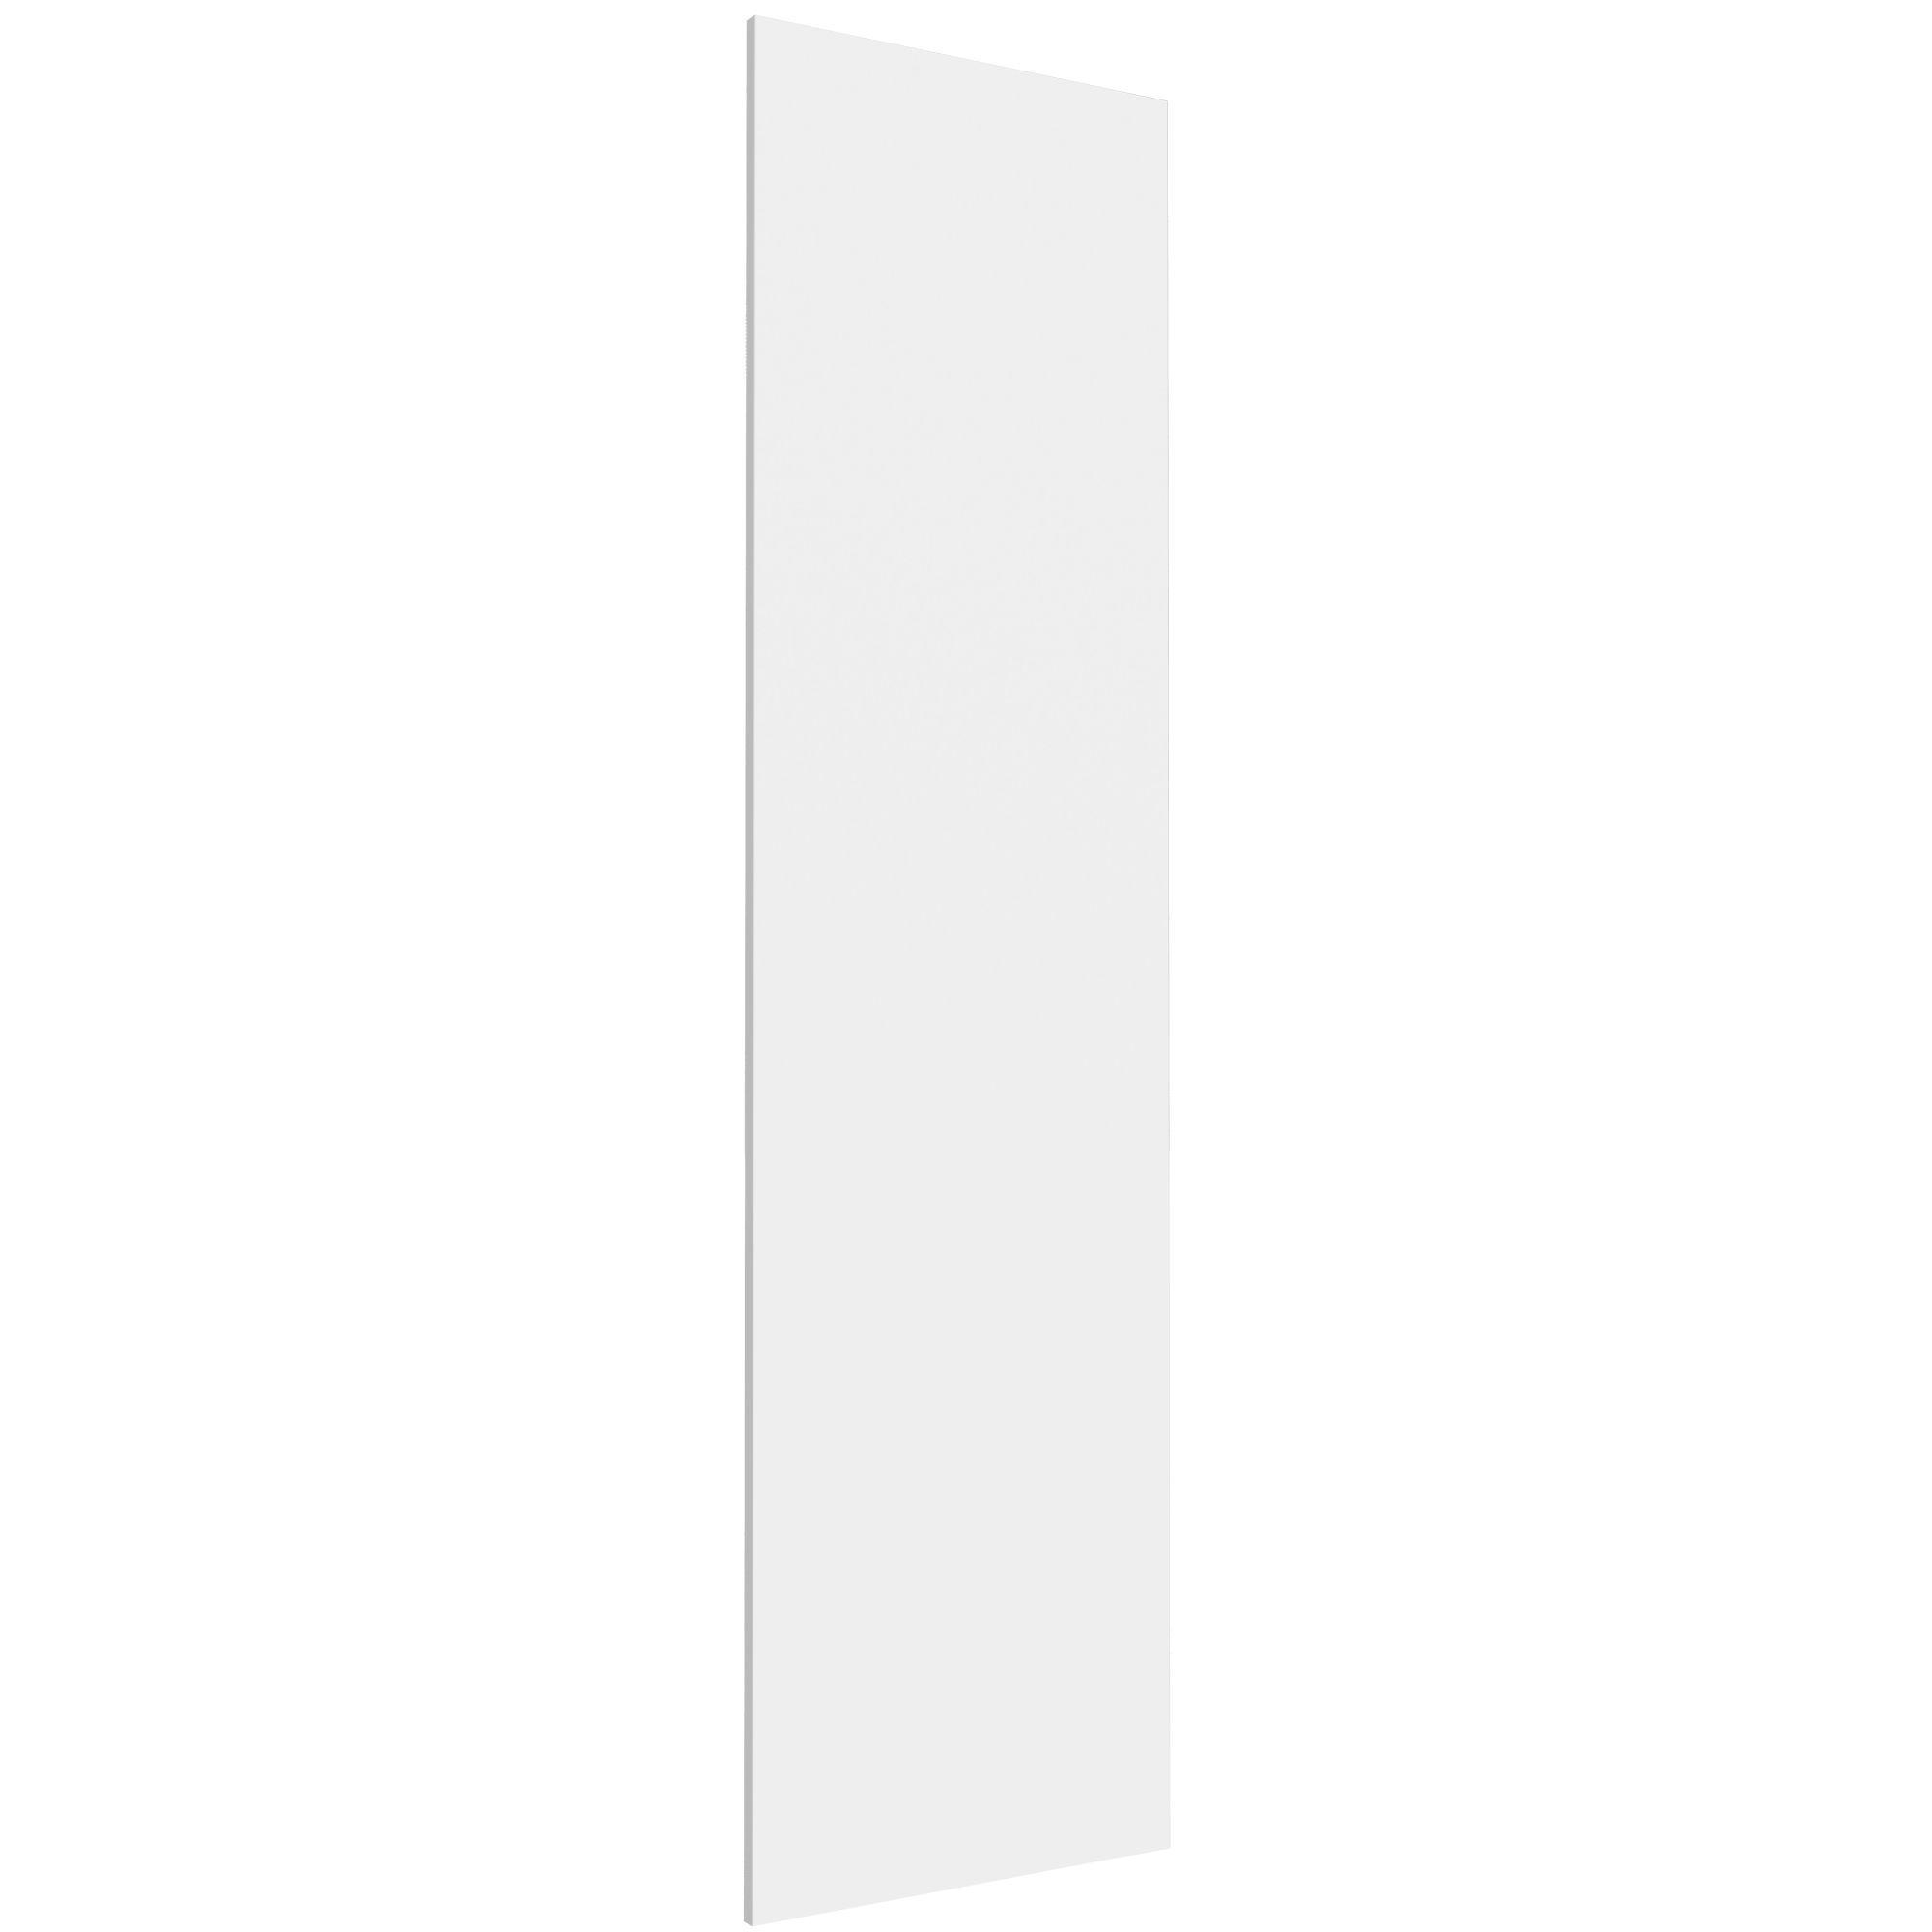 Form Darwin Modular Matt white Wardrobe door (H)1936mm (W)497mm